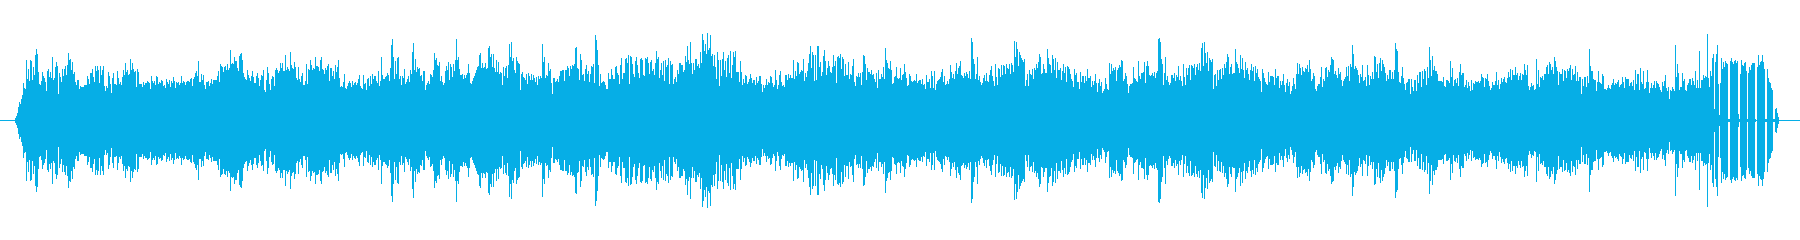 SCI-FI GENERATOR ...の再生済みの波形